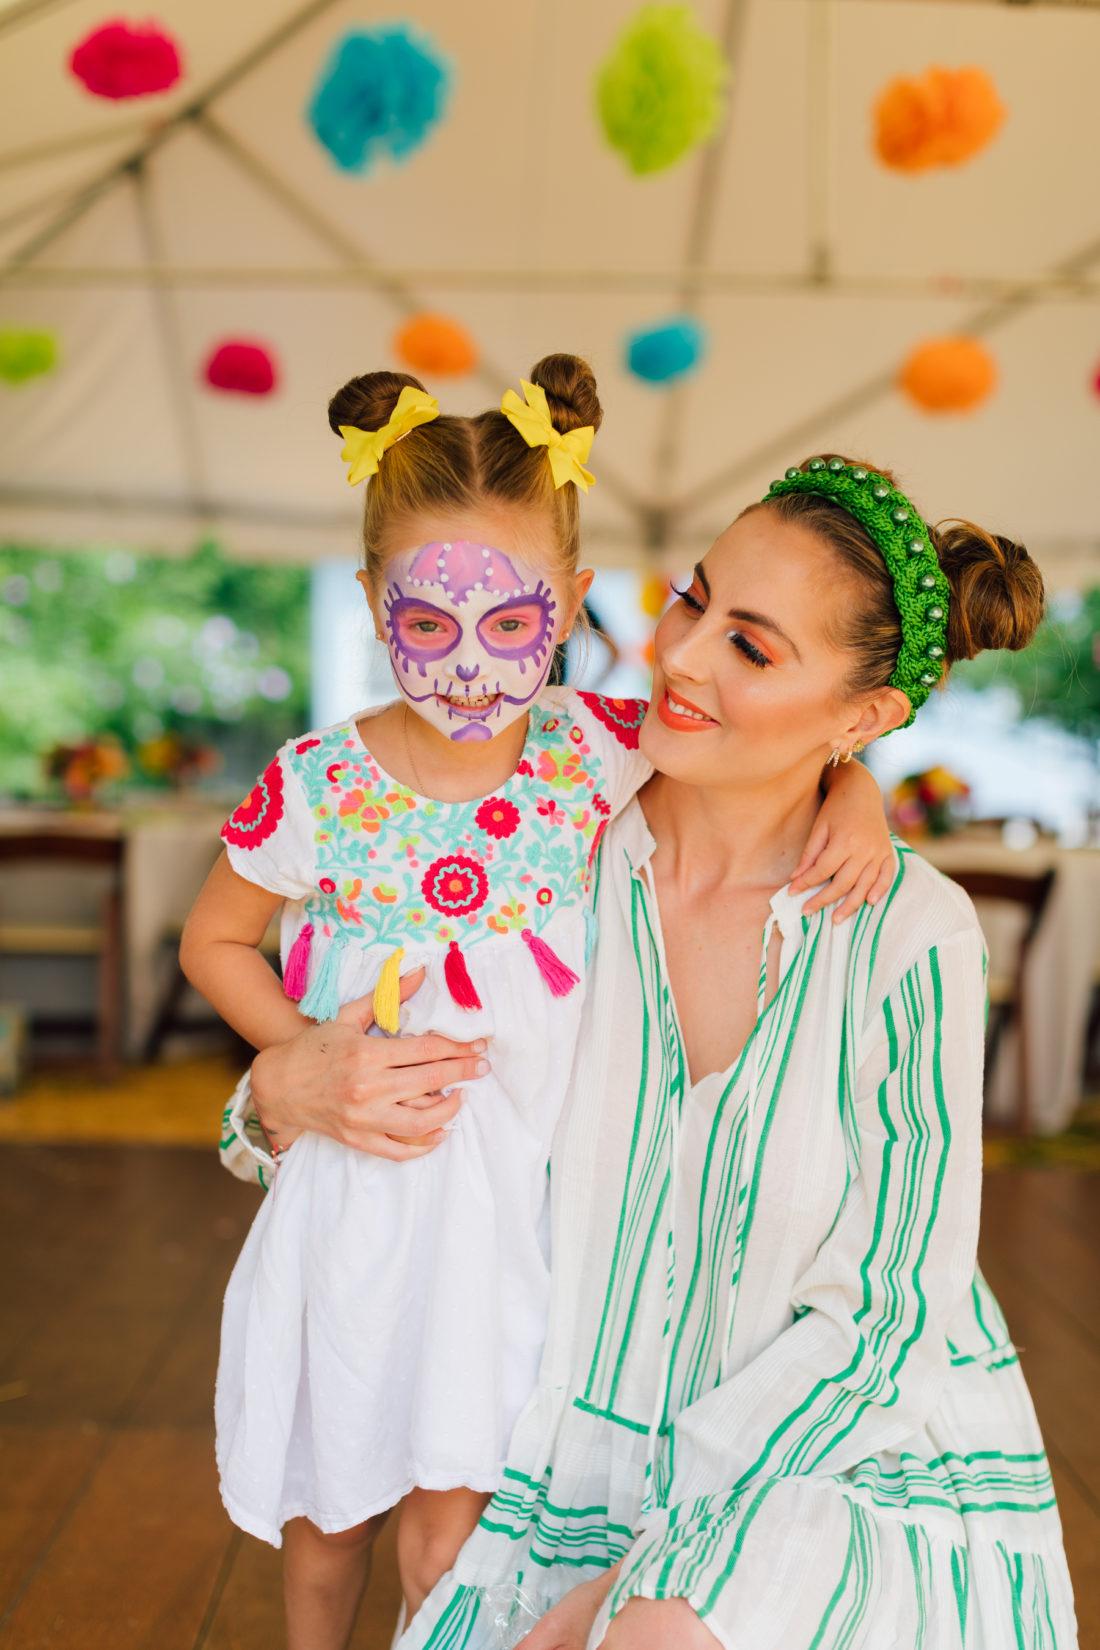 Eva Amurri Martino with daughter Marlowe at her Cinco de Marlowe themed 5th birthday fiesta